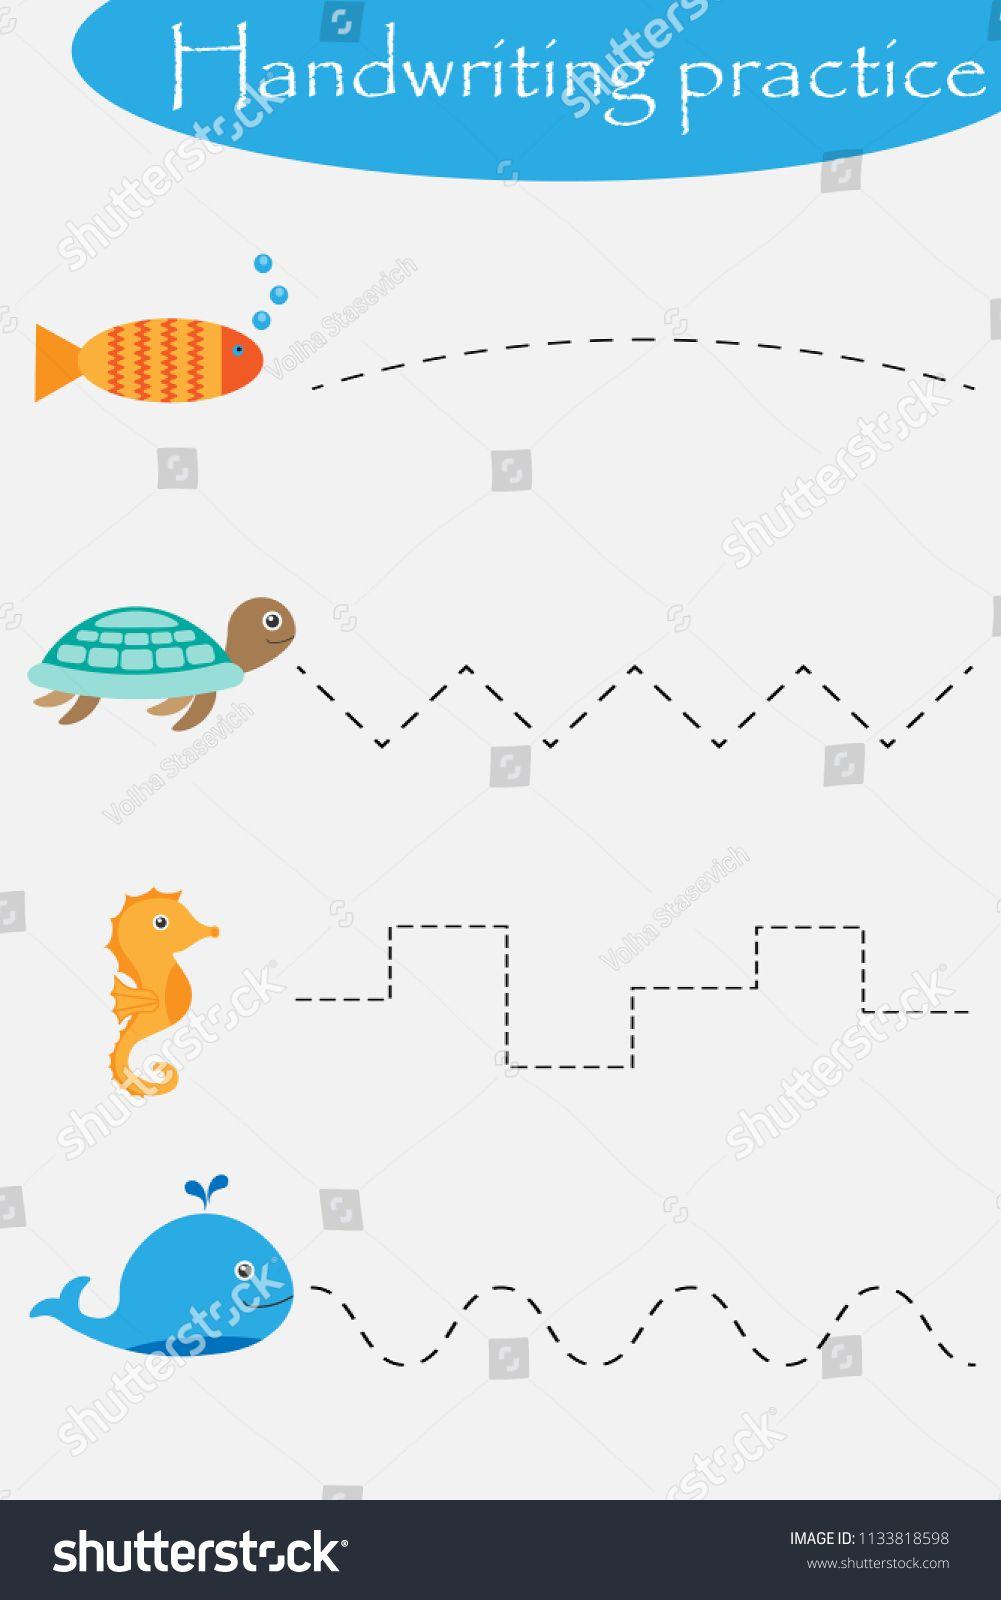 Ocean And Sea Animals Wheel Fish Turtle Seahorse Handwriting Practice Handwriting Practice Sheets Handwriting Practice Worksheets Writing Practice Sheets [ 1600 x 1001 Pixel ]